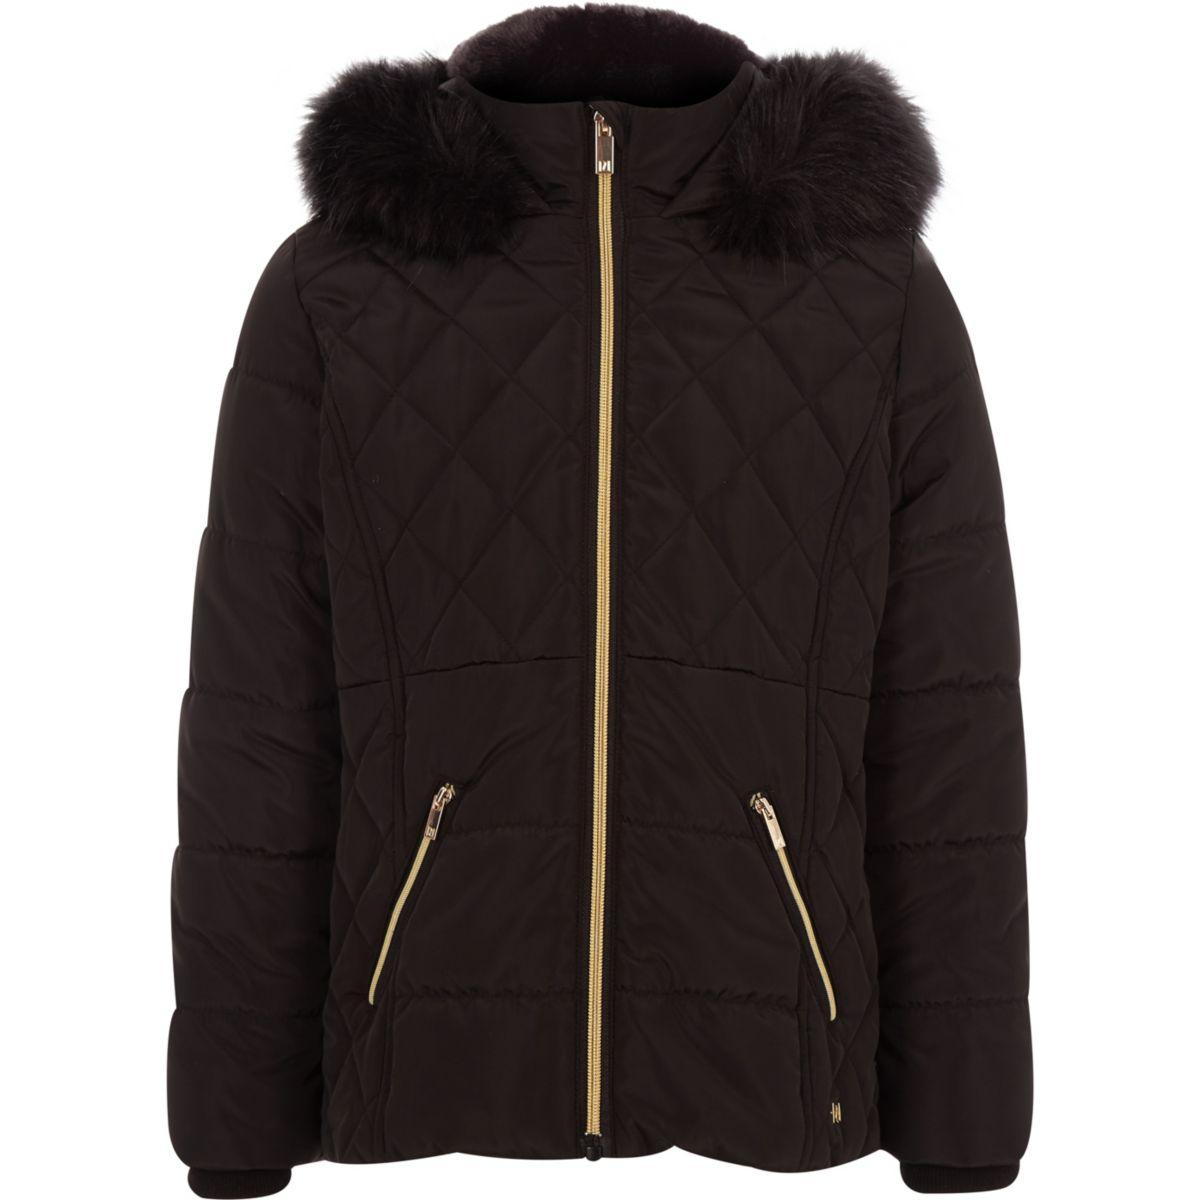 18d889ee0 Girls black faux fur trim padded coat - Jackets - Coats & Jackets - girls